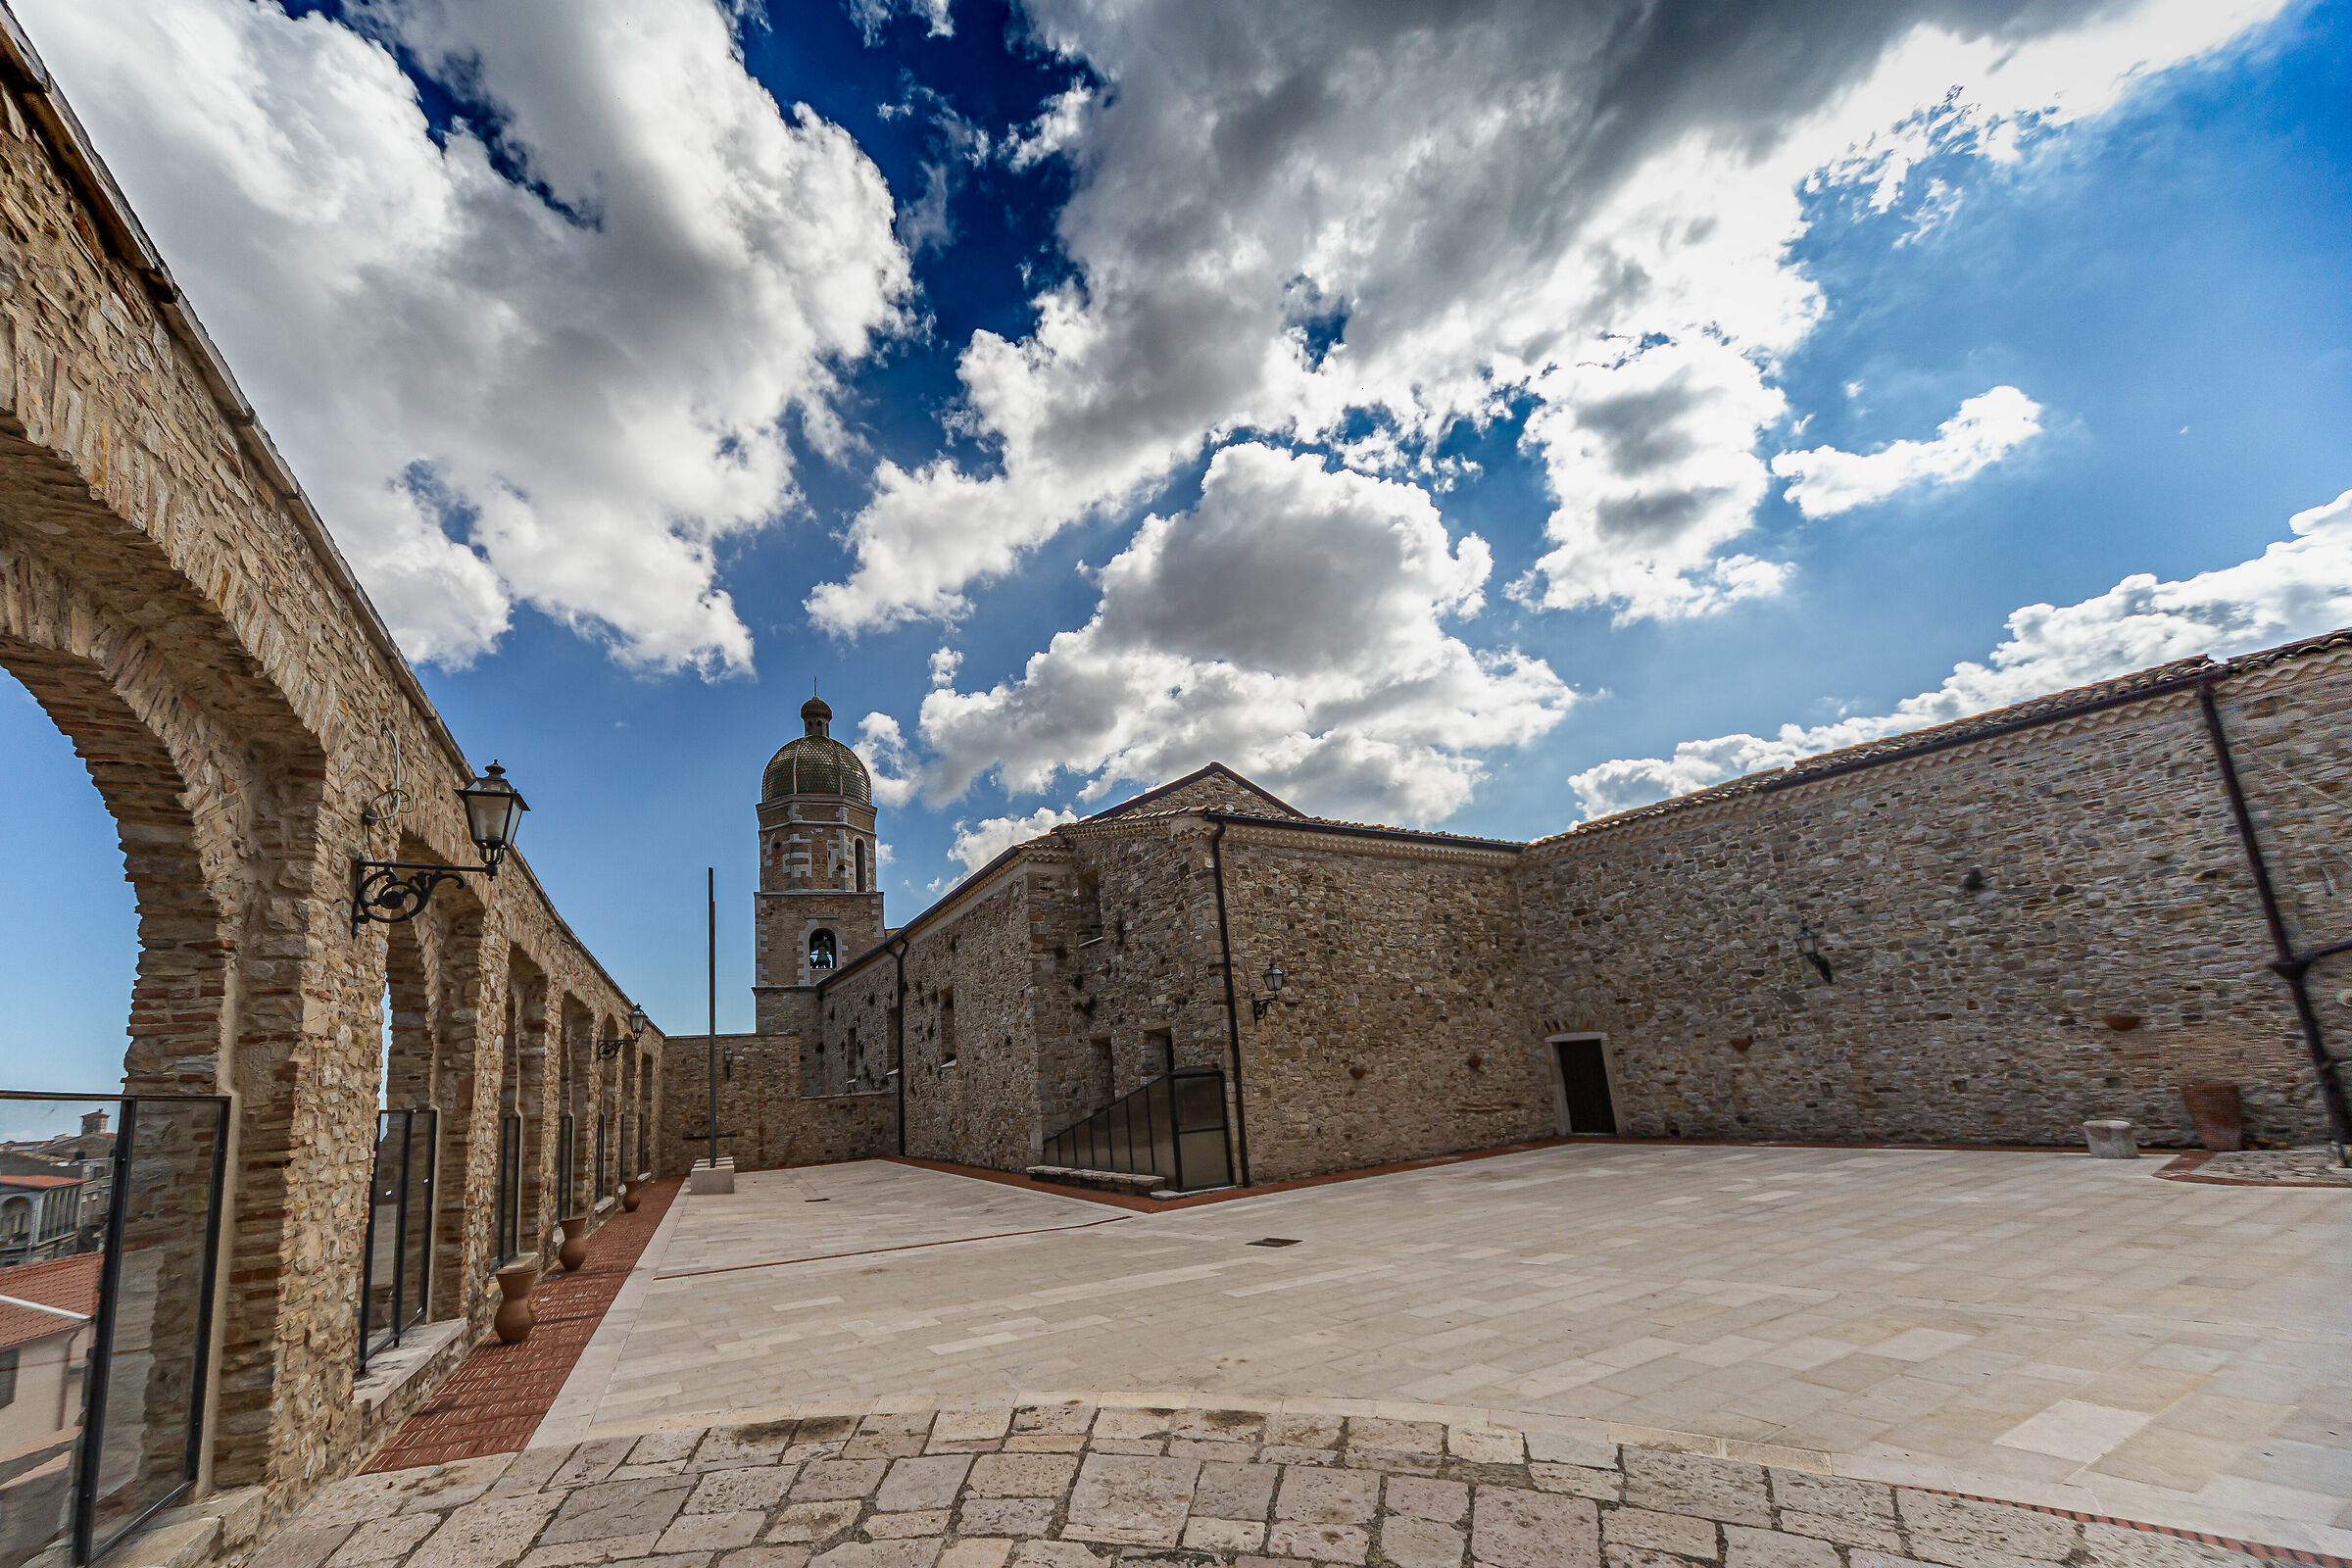 Clouds over stone, Pietramontecorvino, Italy...